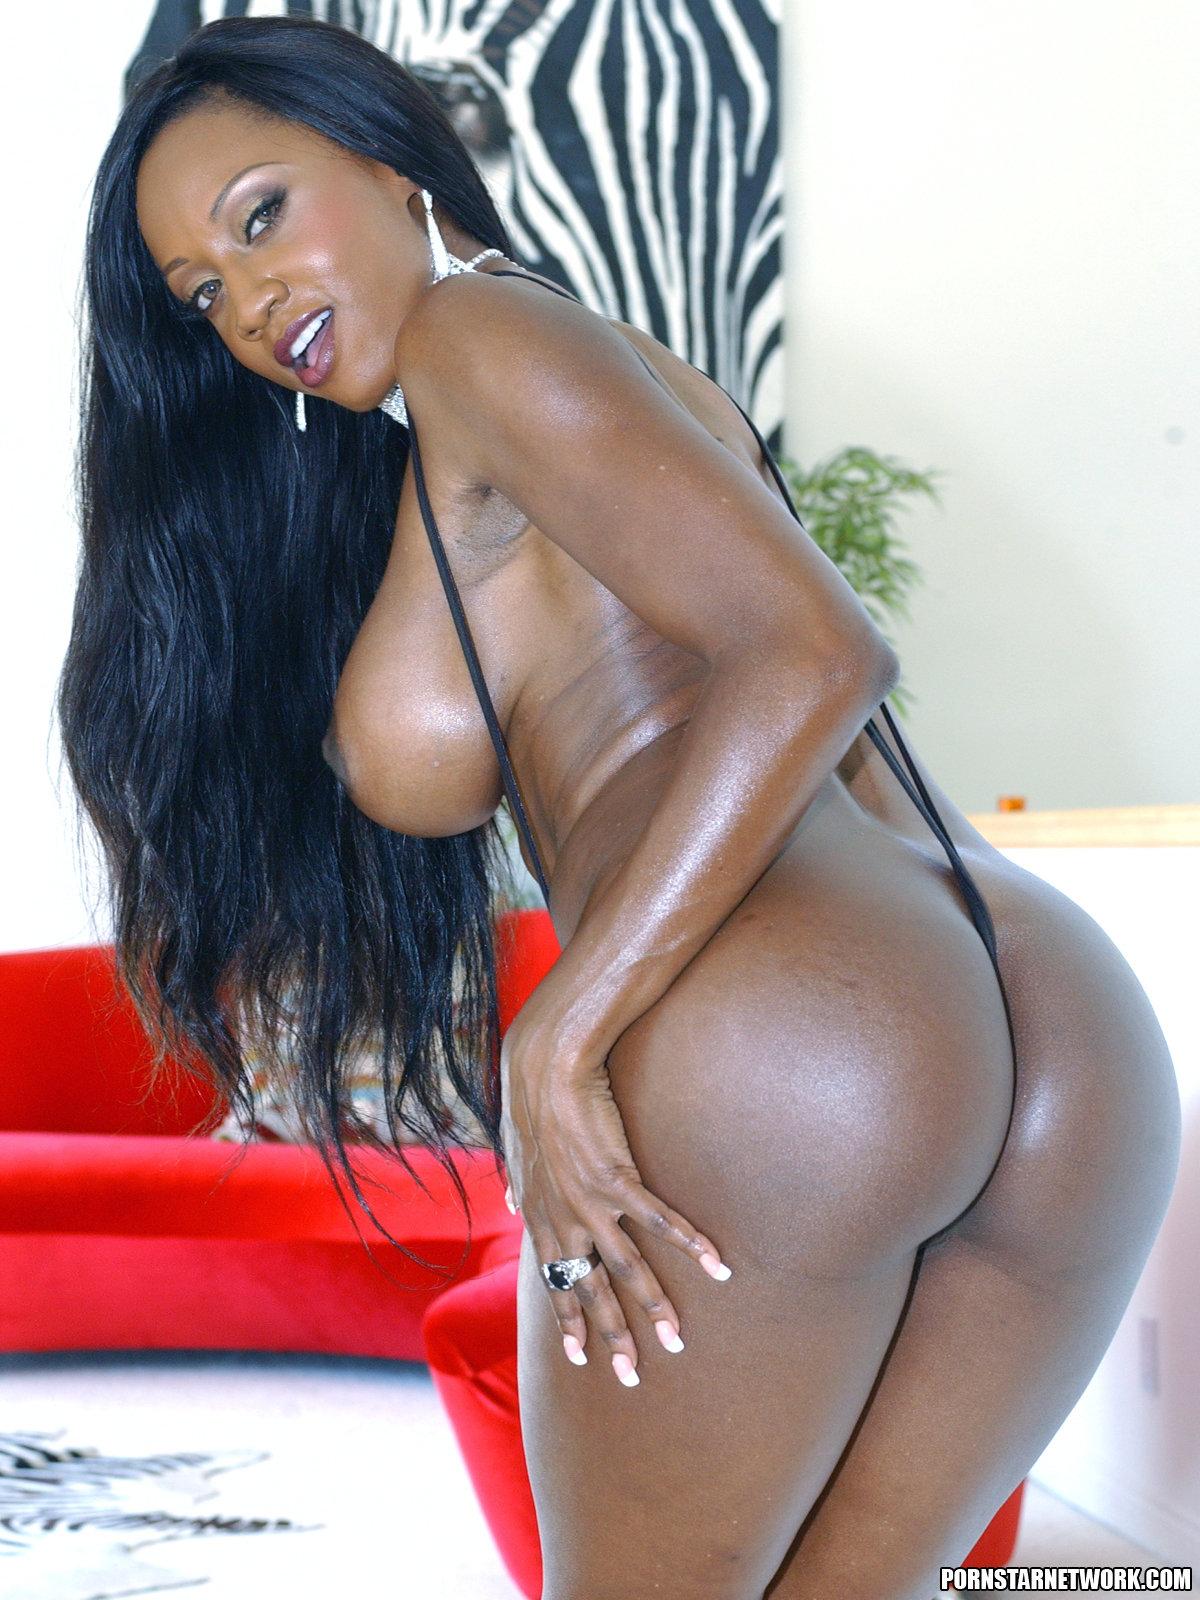 Big booty black gay porn porn pics, sex photos, xxx images